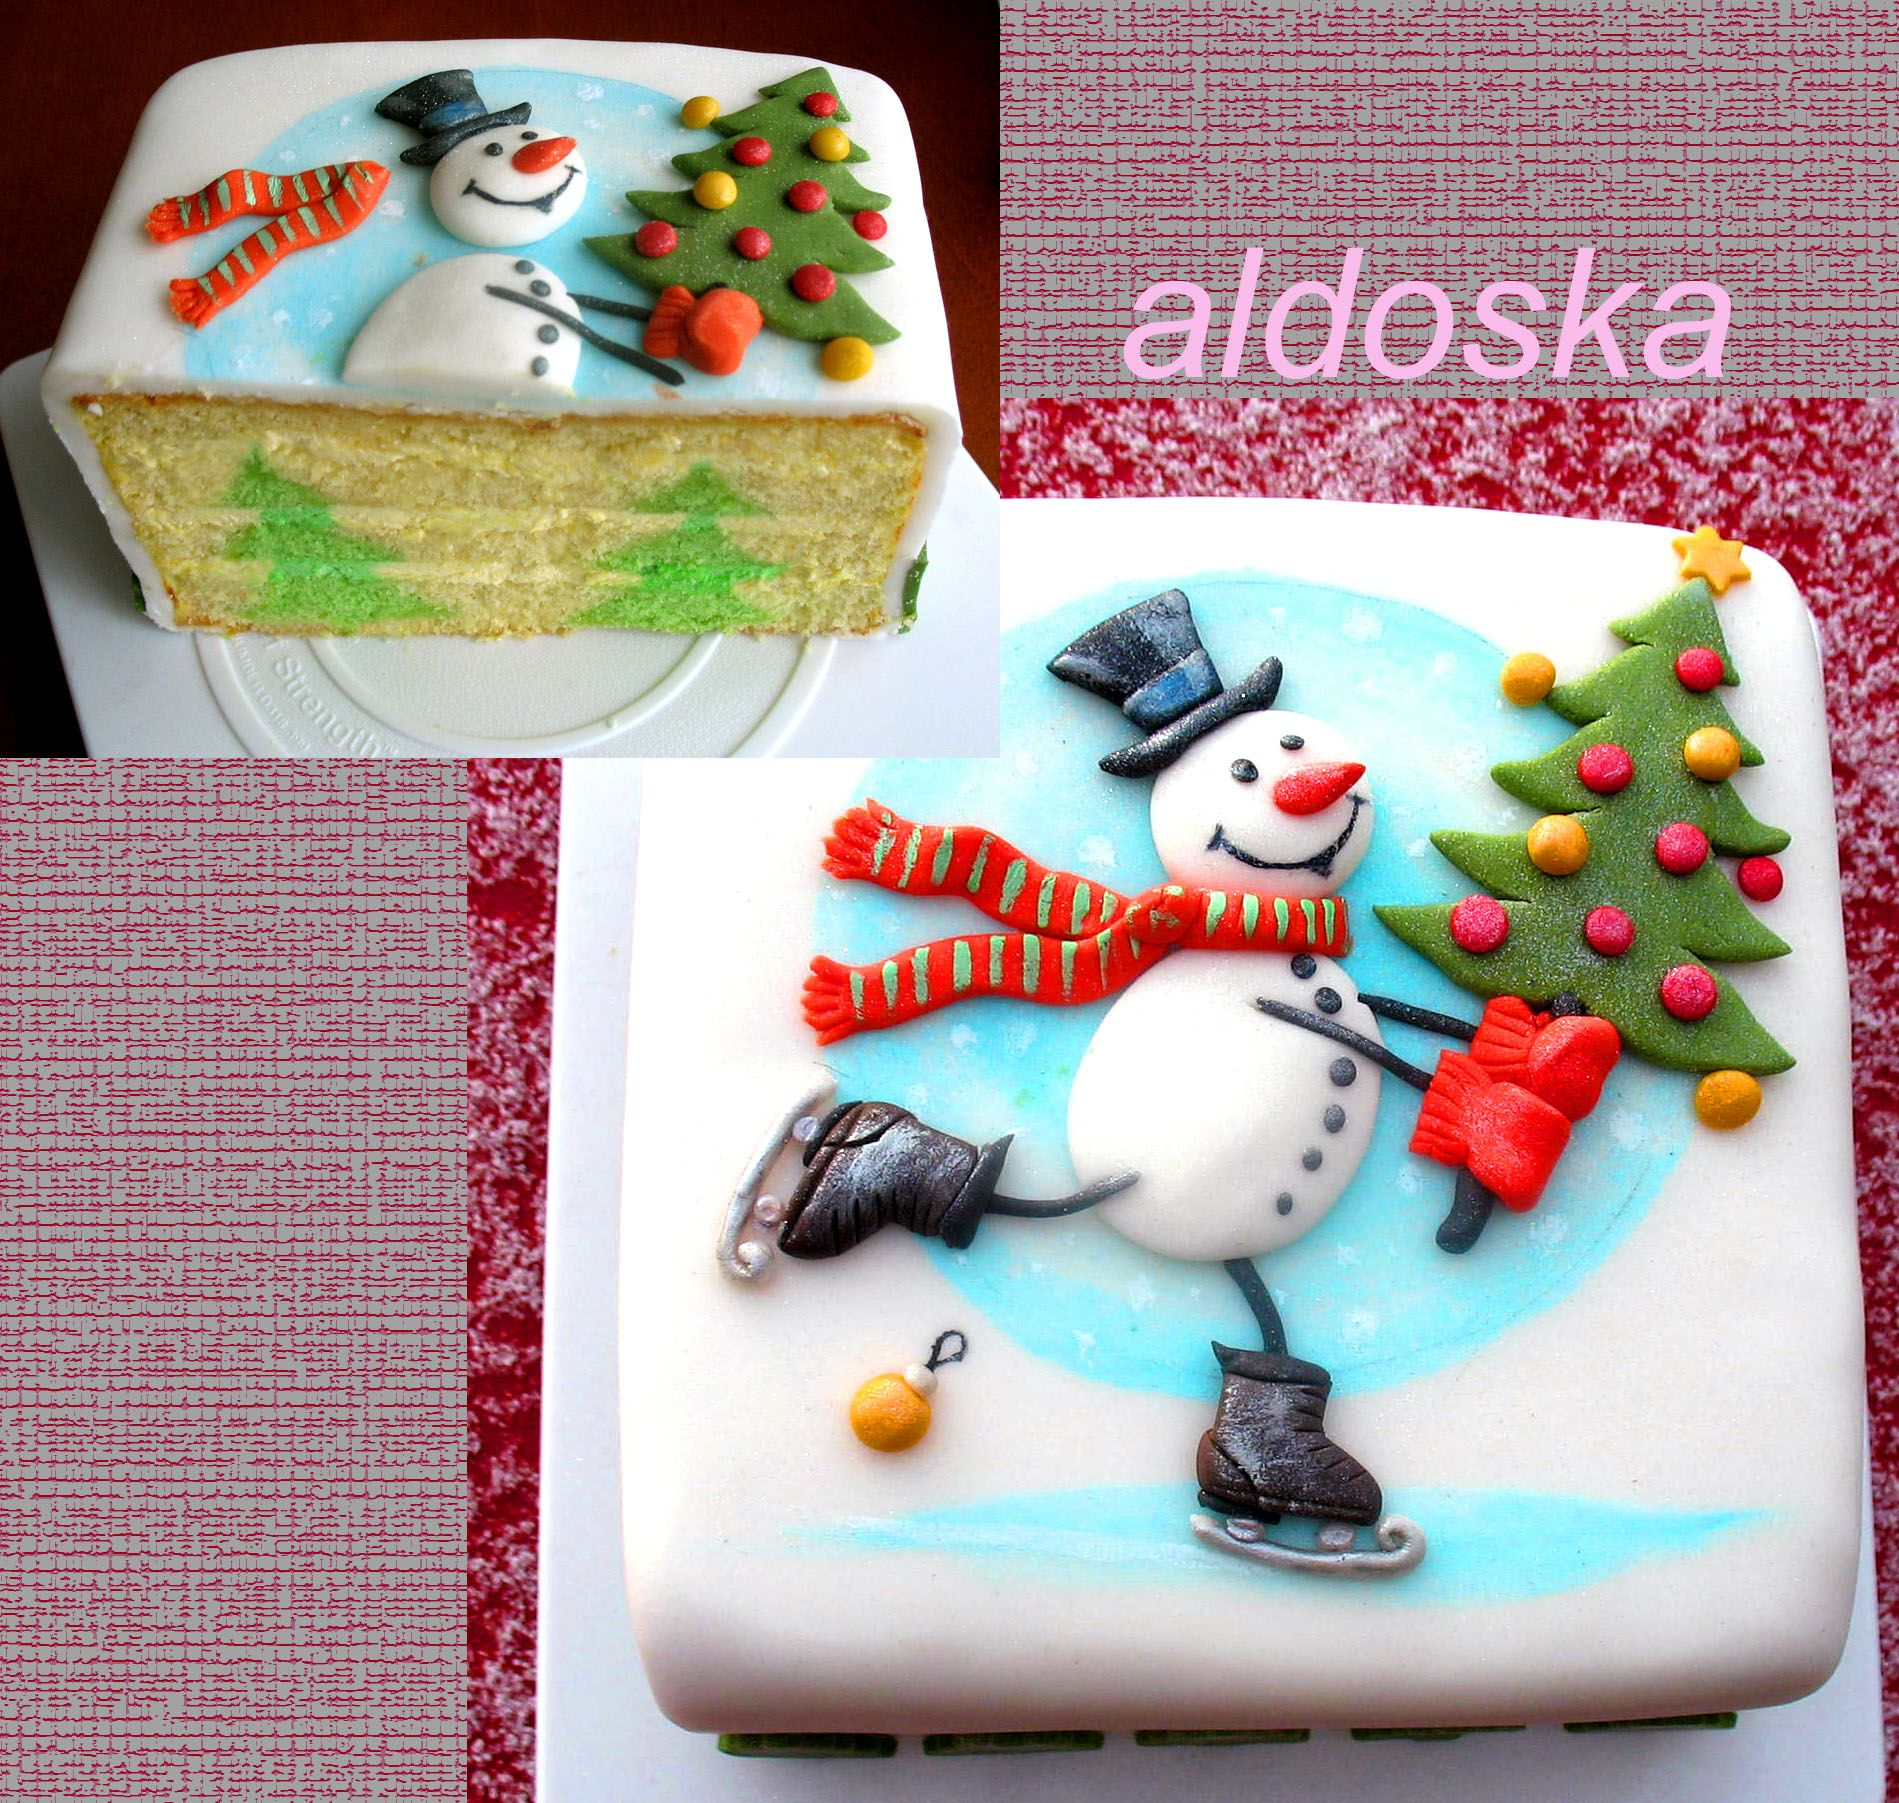 Snowman cake with tree inside - Tutorial is here:  http://cakesdecor.com/aldoska/blog/389